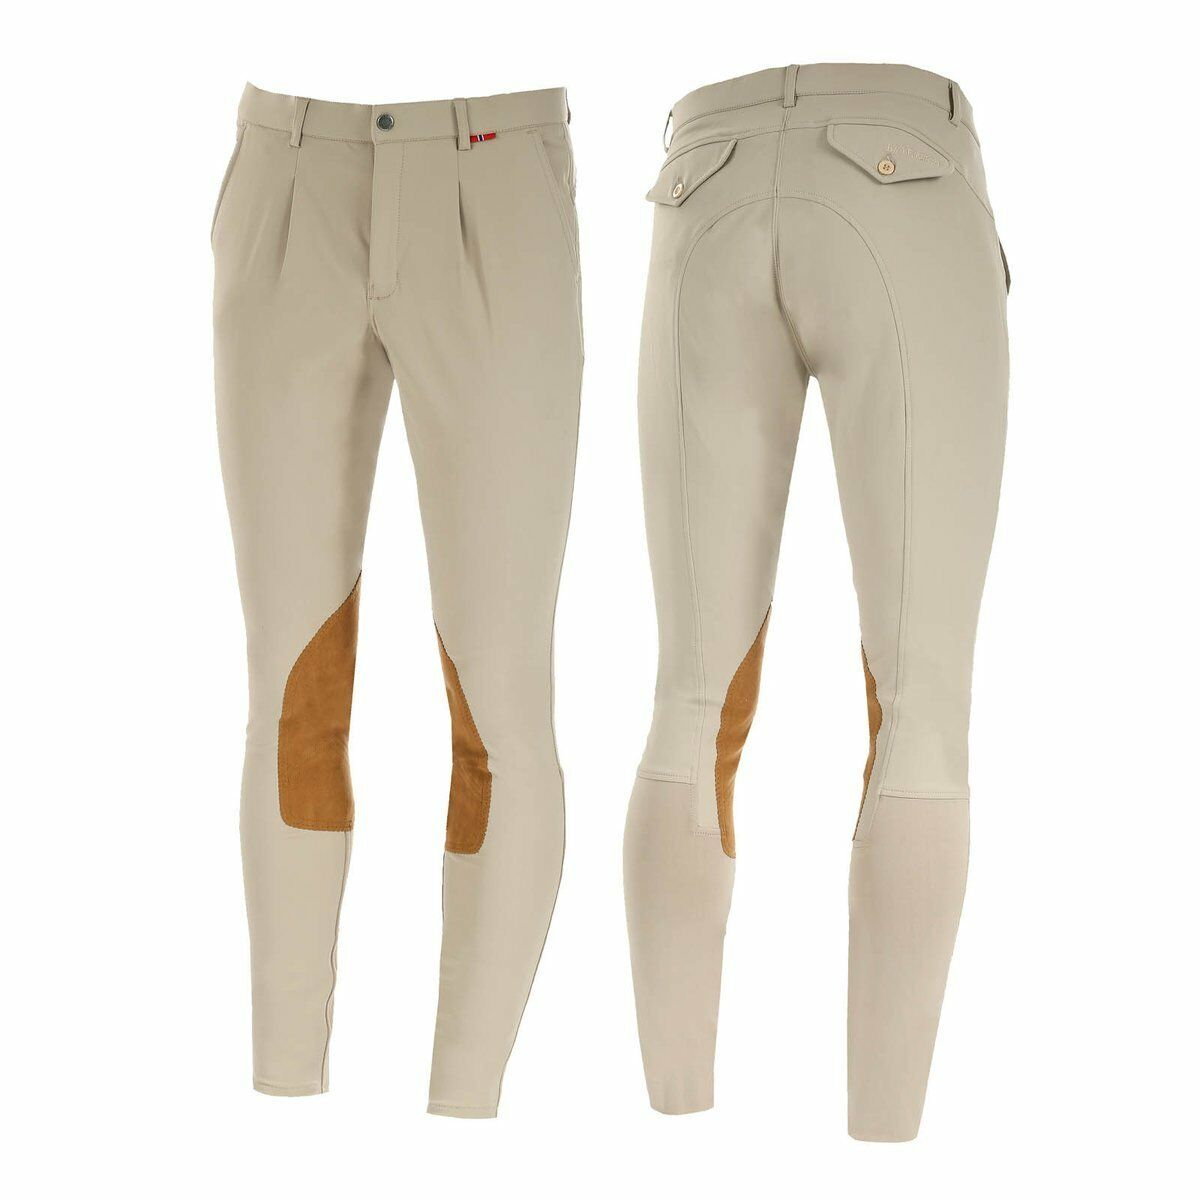 B Vertigo Sander Uomo Pelle Pelle Pelle Knee Patch Breeches Safari Size 30 1ad2f7